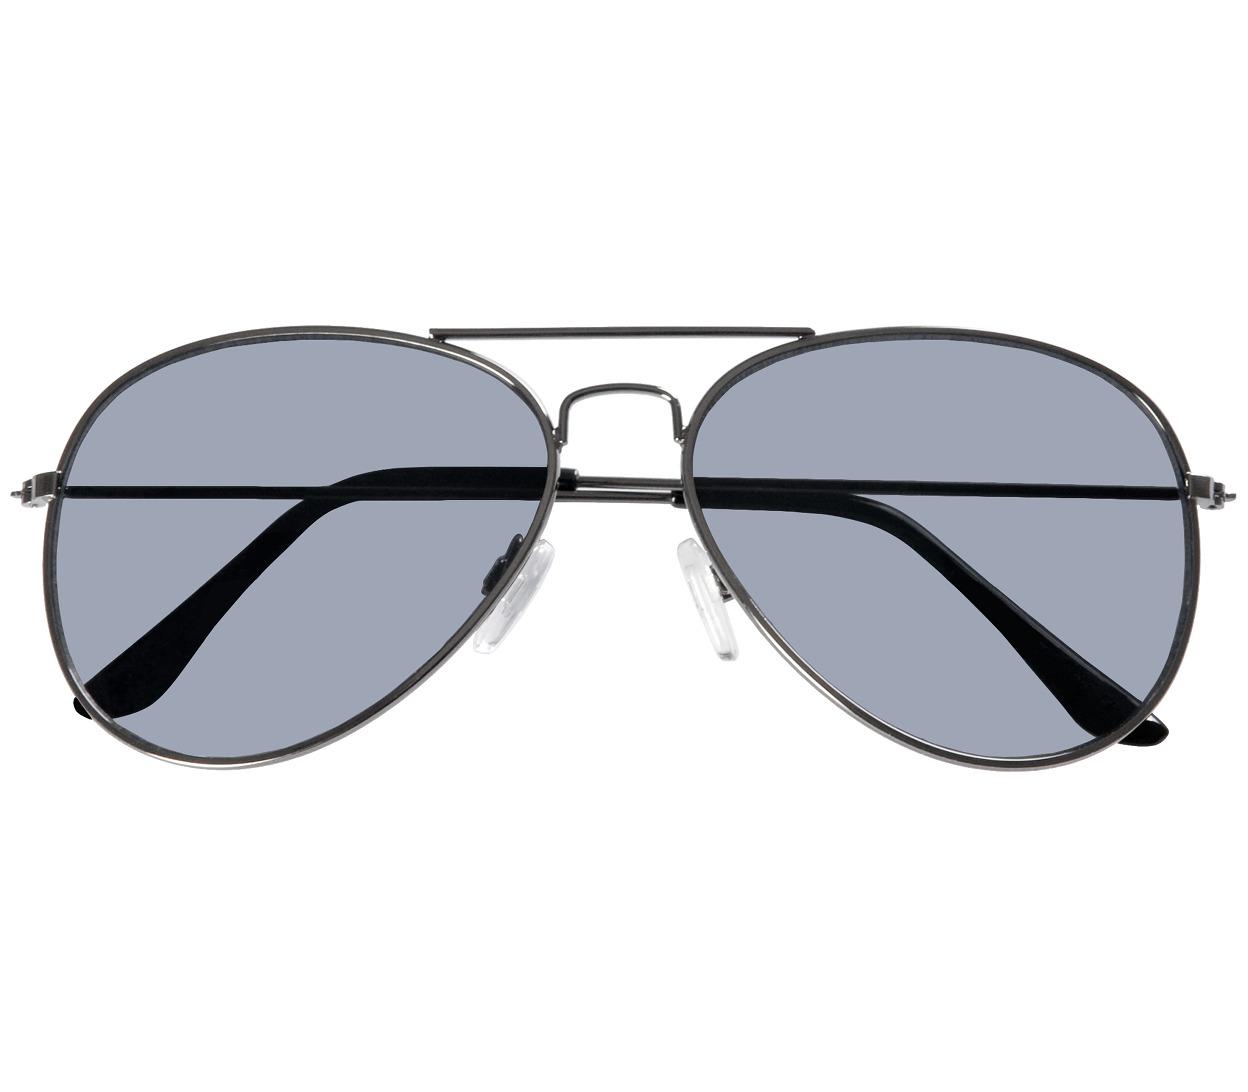 9599e9ad366 Ace (Gunmetal) Sun Readers - Tiger Specs